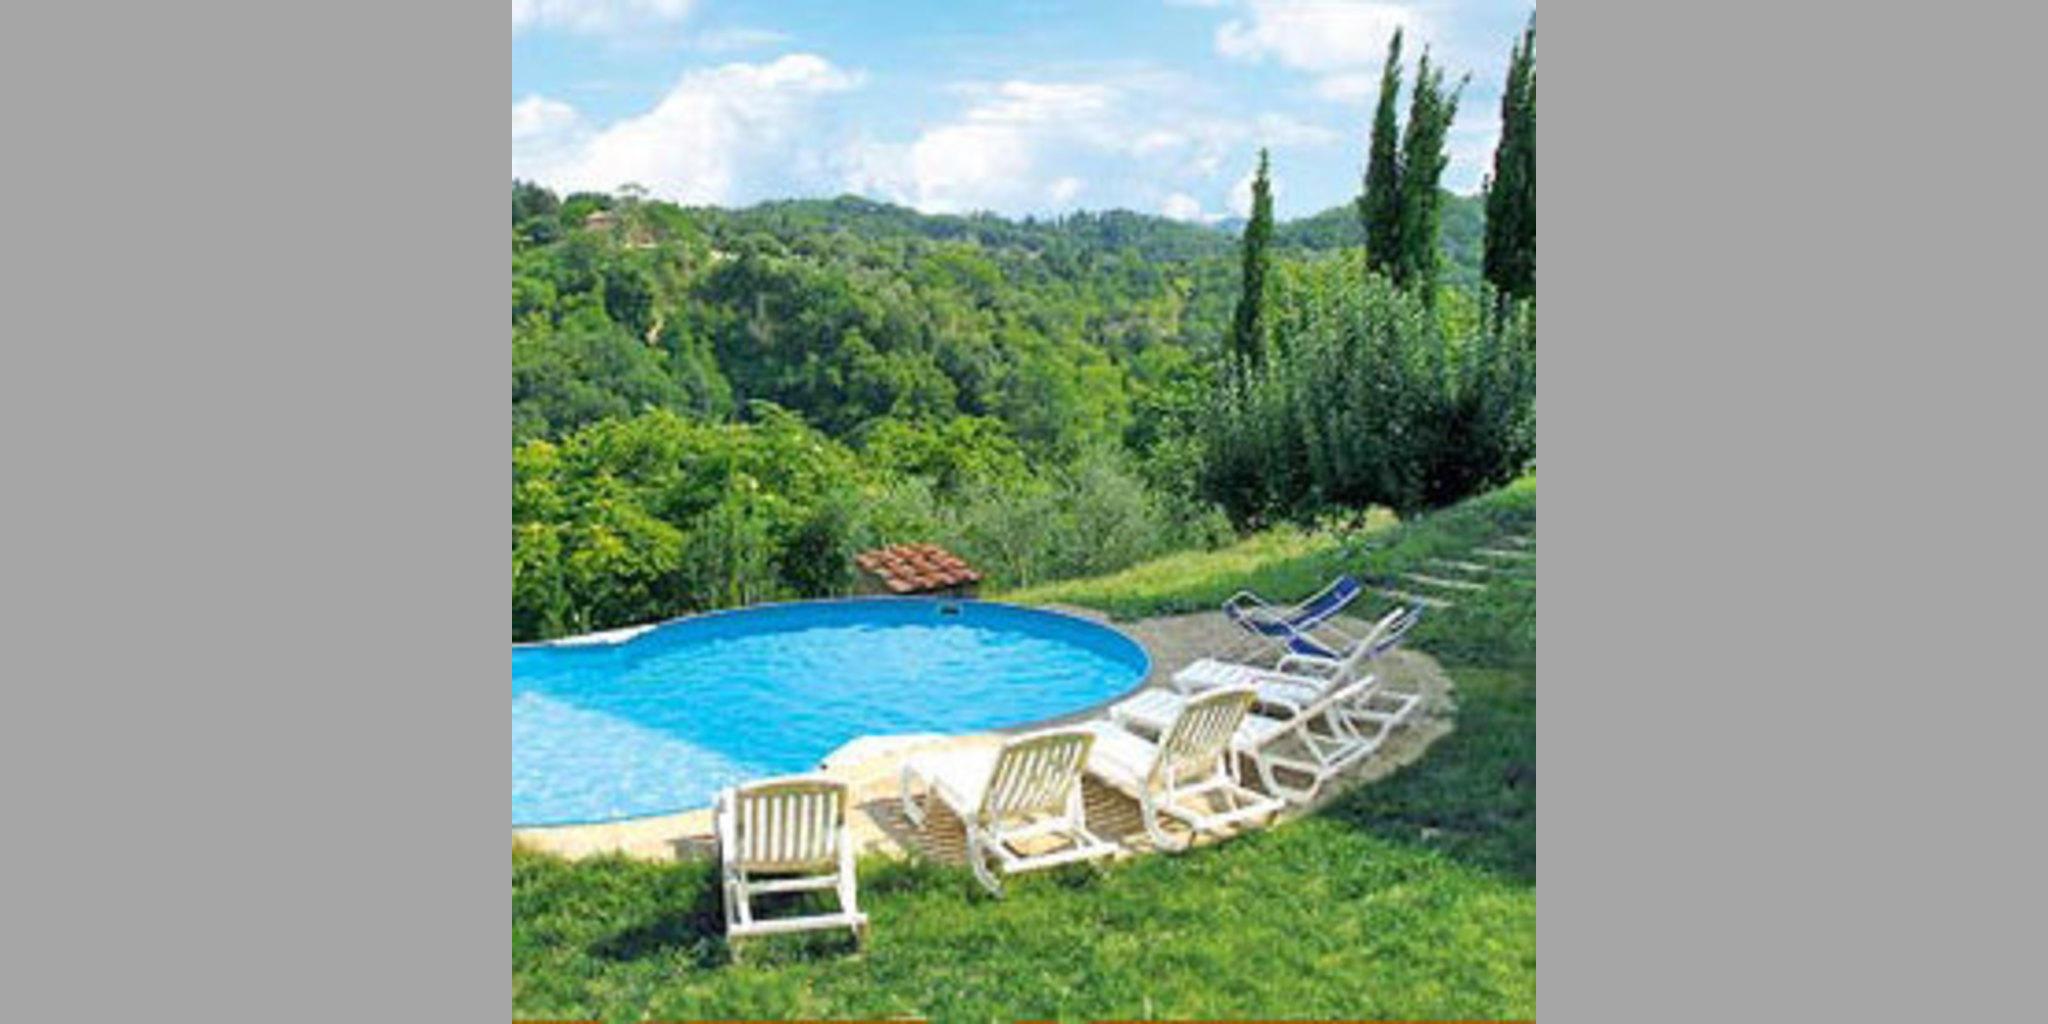 Bed & Breakfast Palaia - Reception Address:  Carbonaia